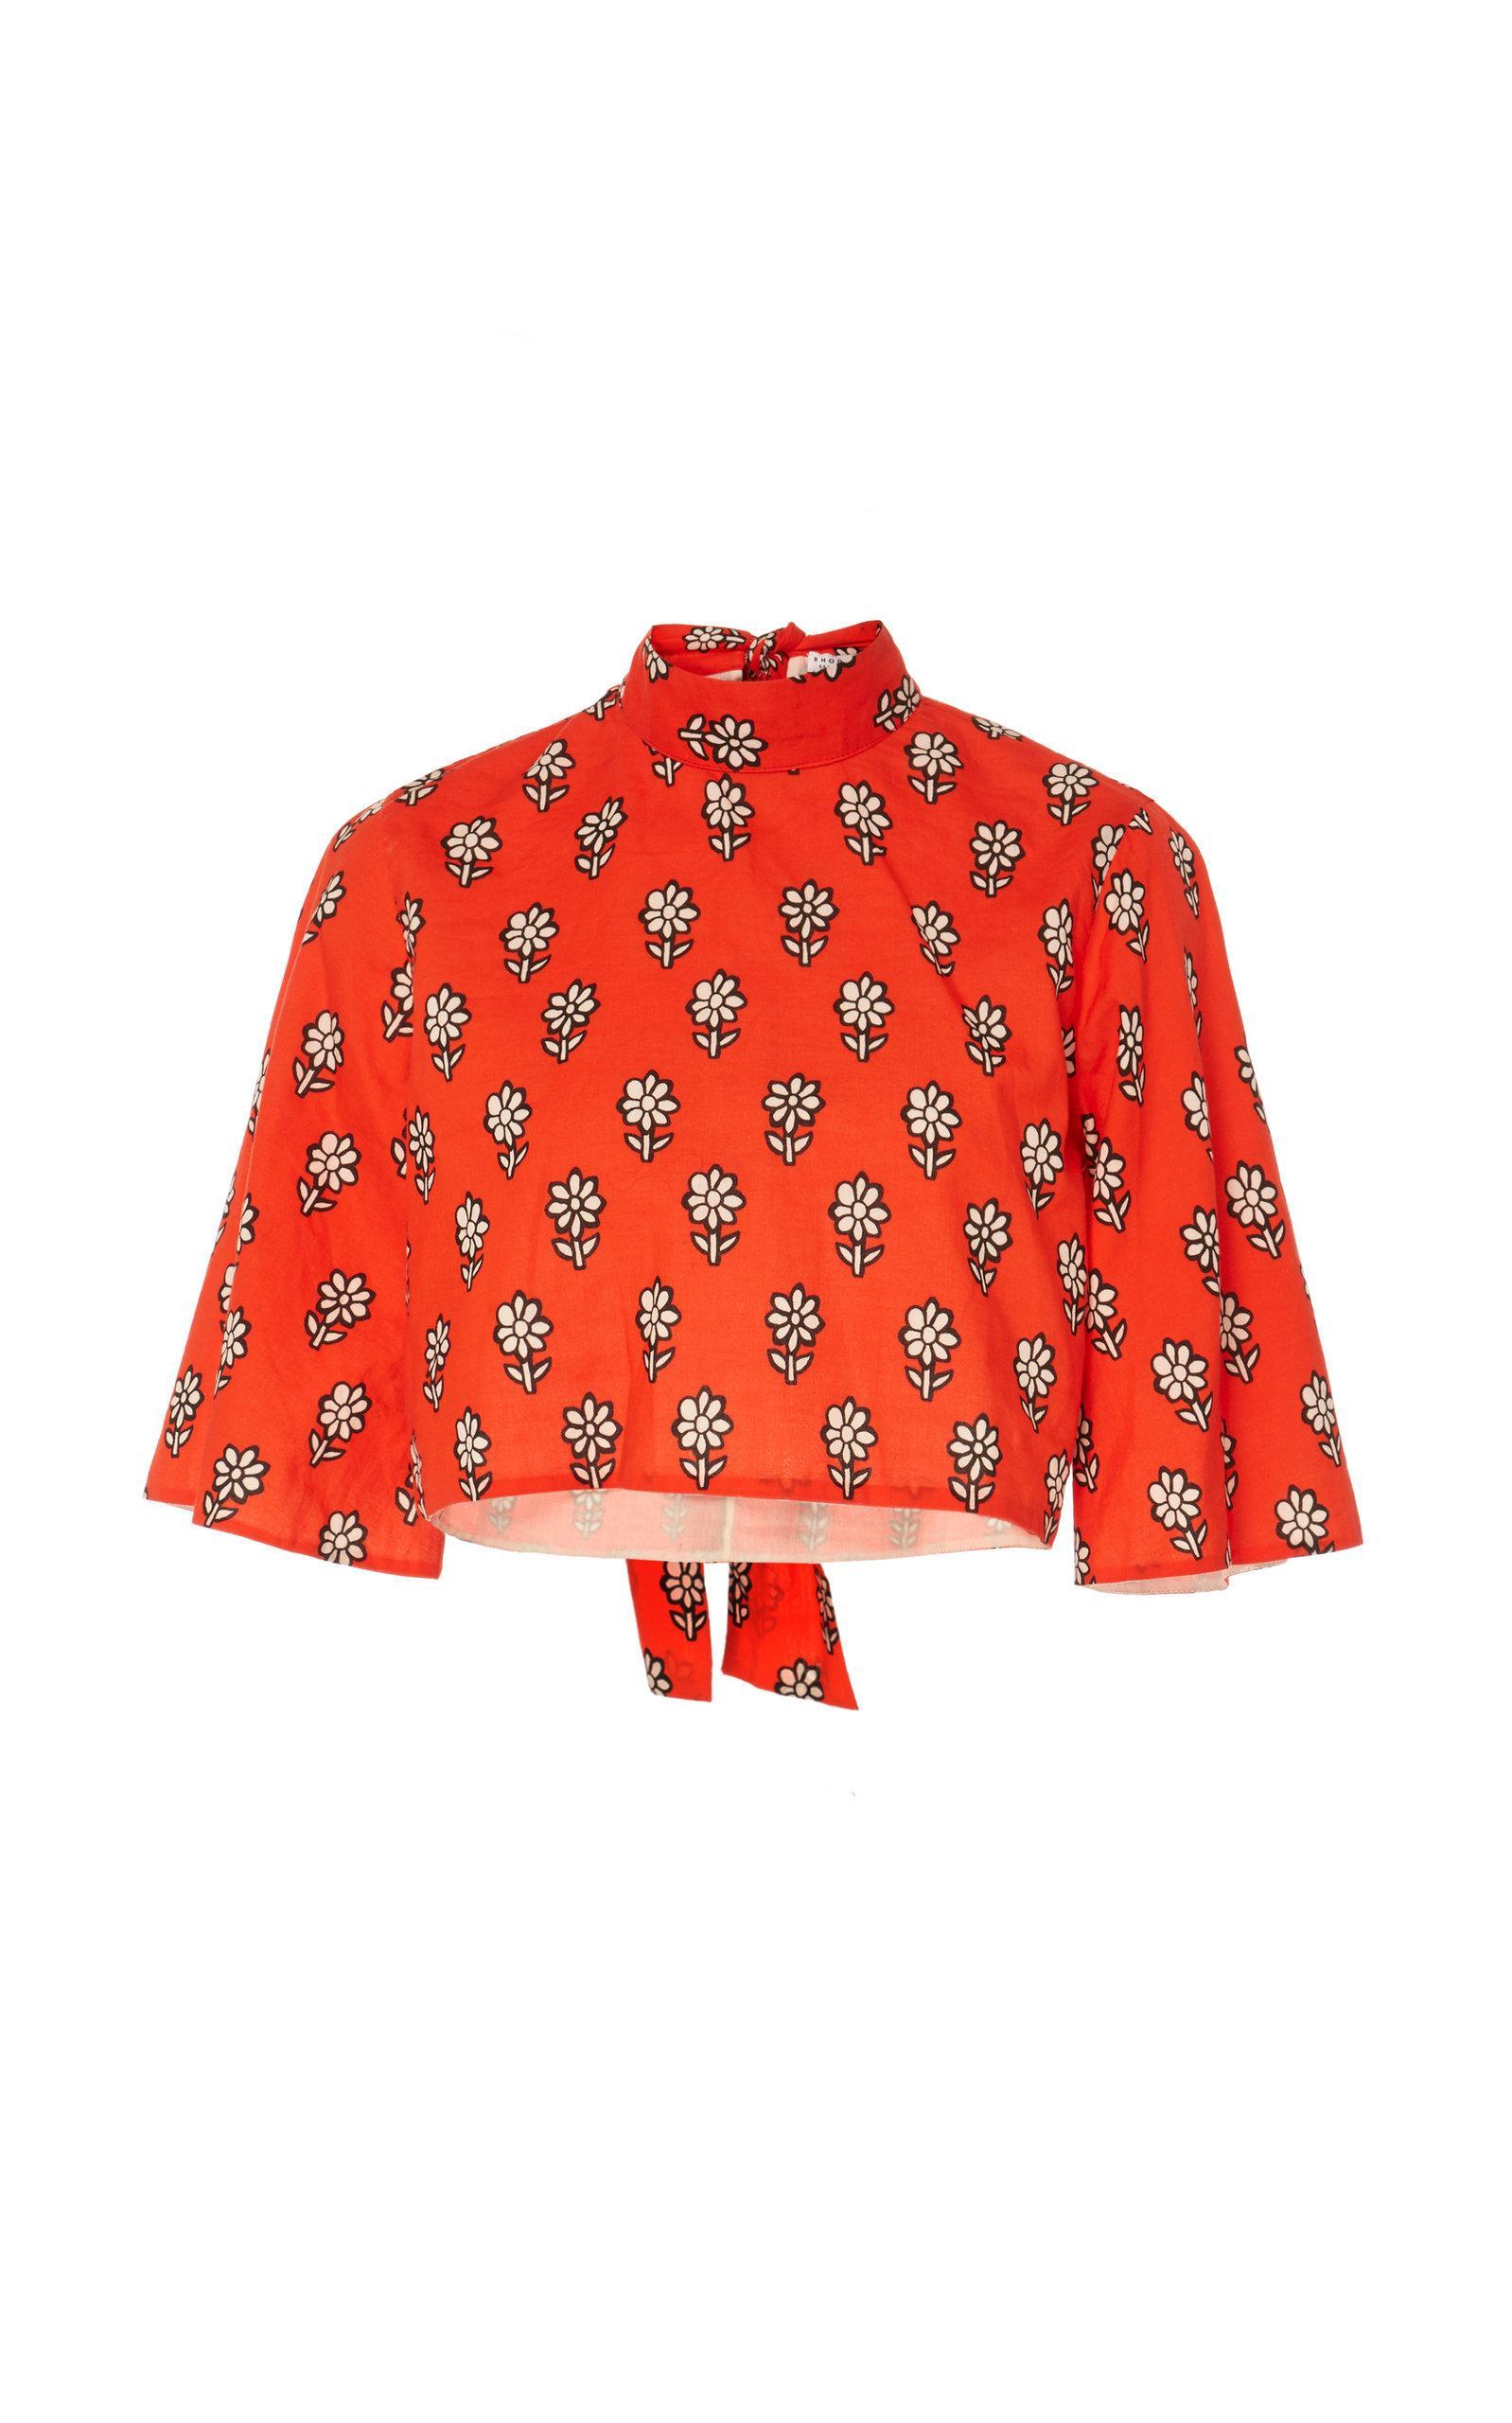 Rhode Audrey Cotton Top In Red